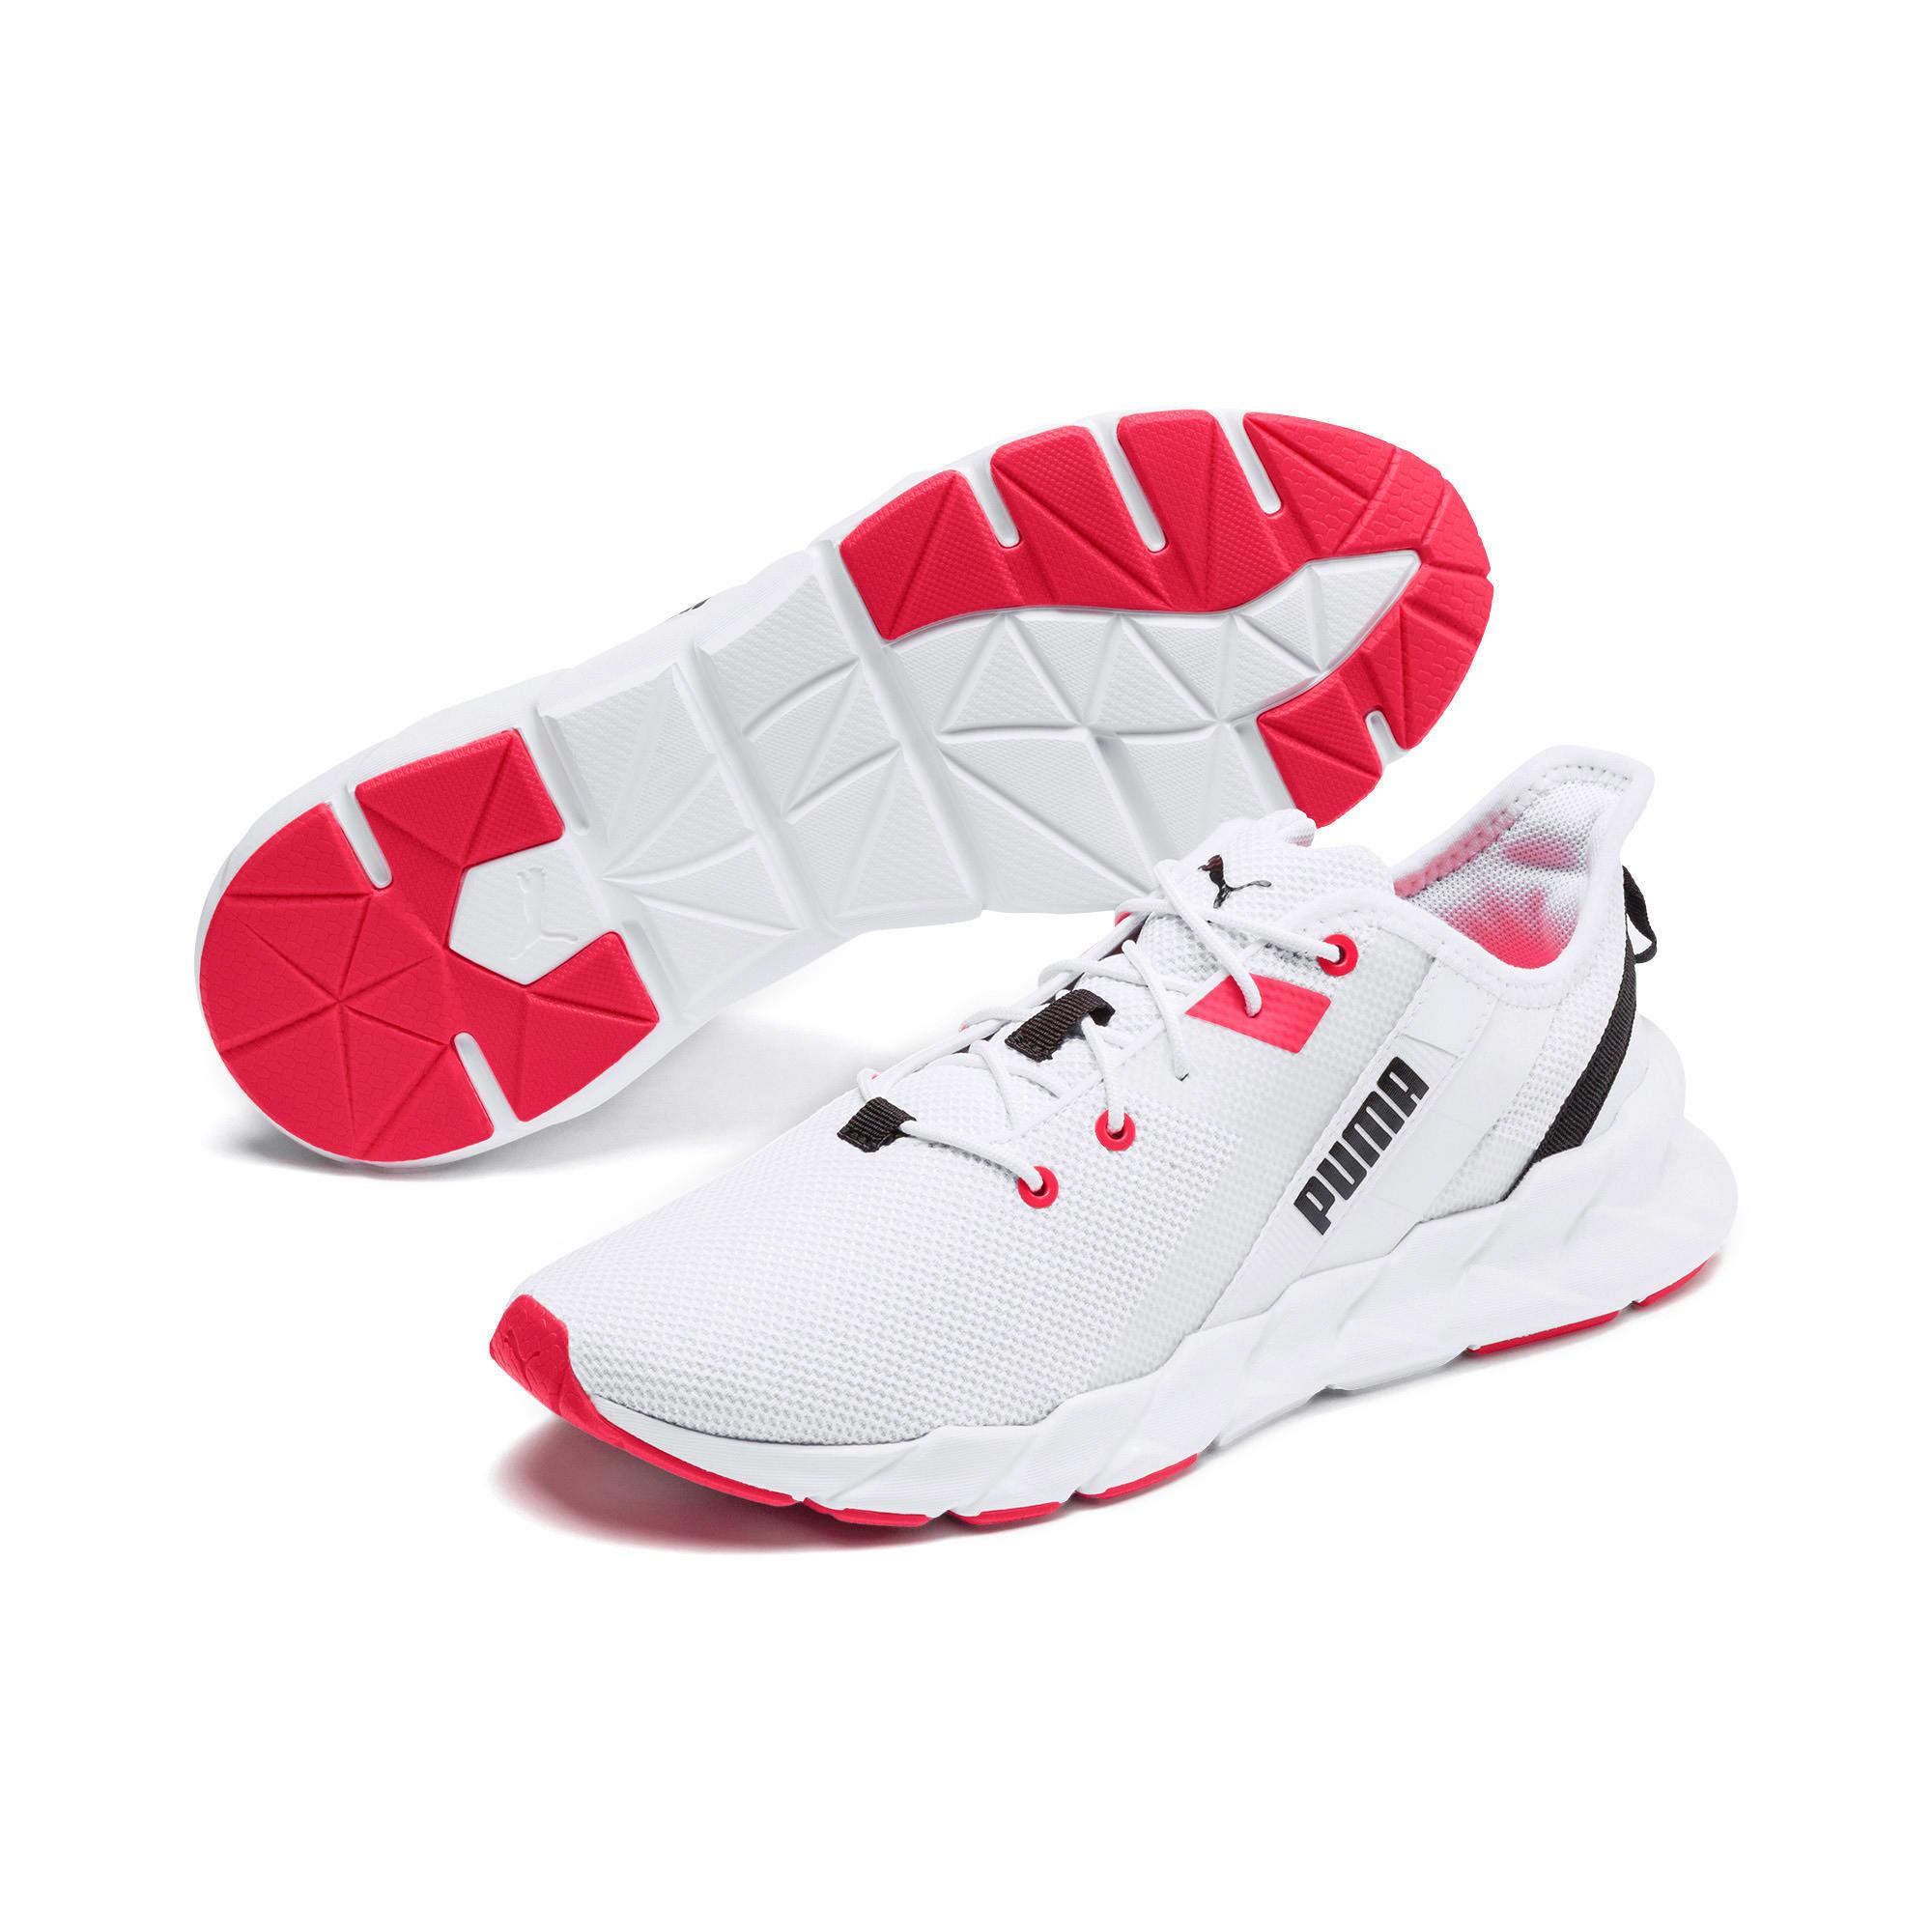 Thumbnail 4 of Weave XT Women's Training Shoes, Puma White-Pink Alert, medium-IND